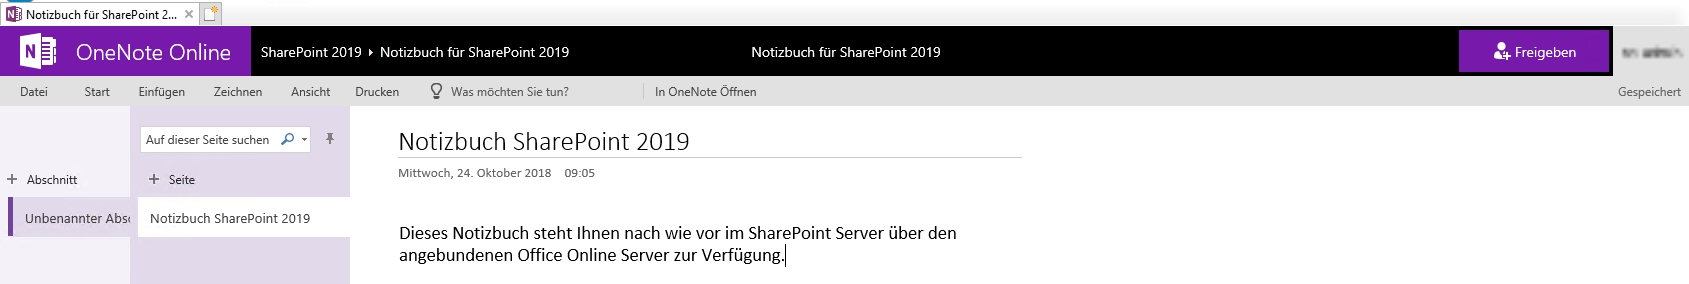 OneNote SharePoint 2019